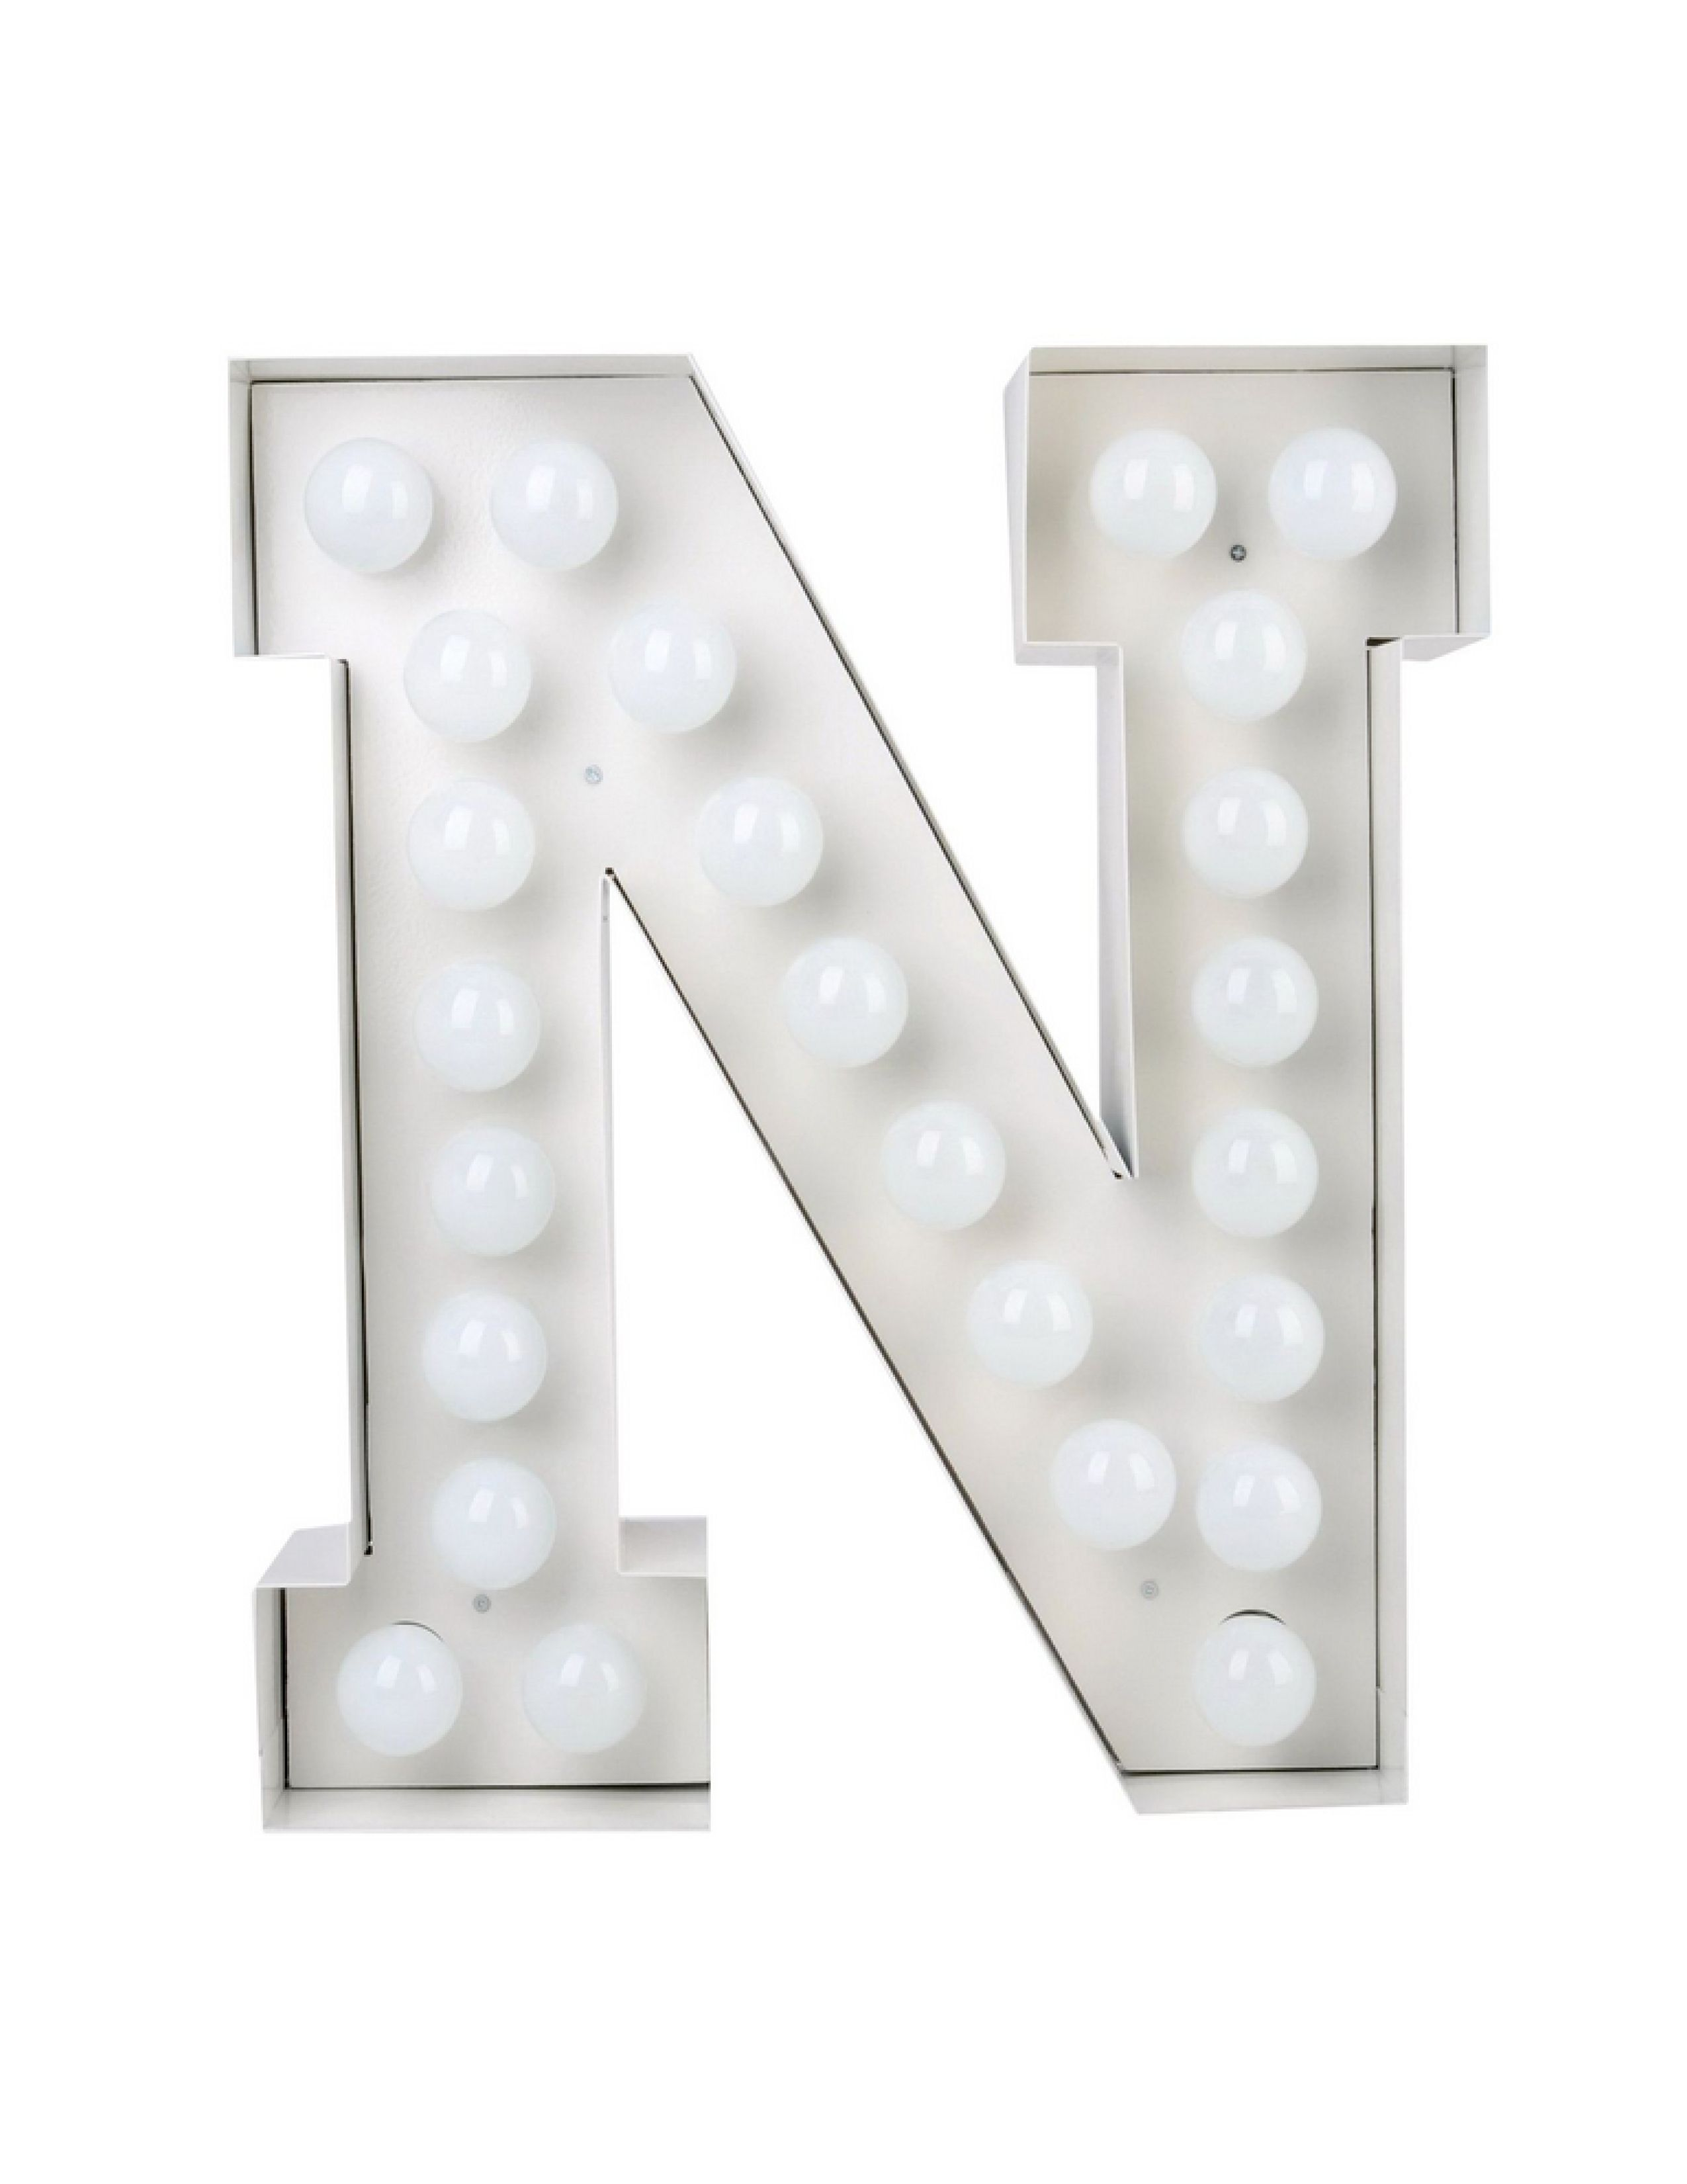 Seletti VEGAZ LED verlichting N